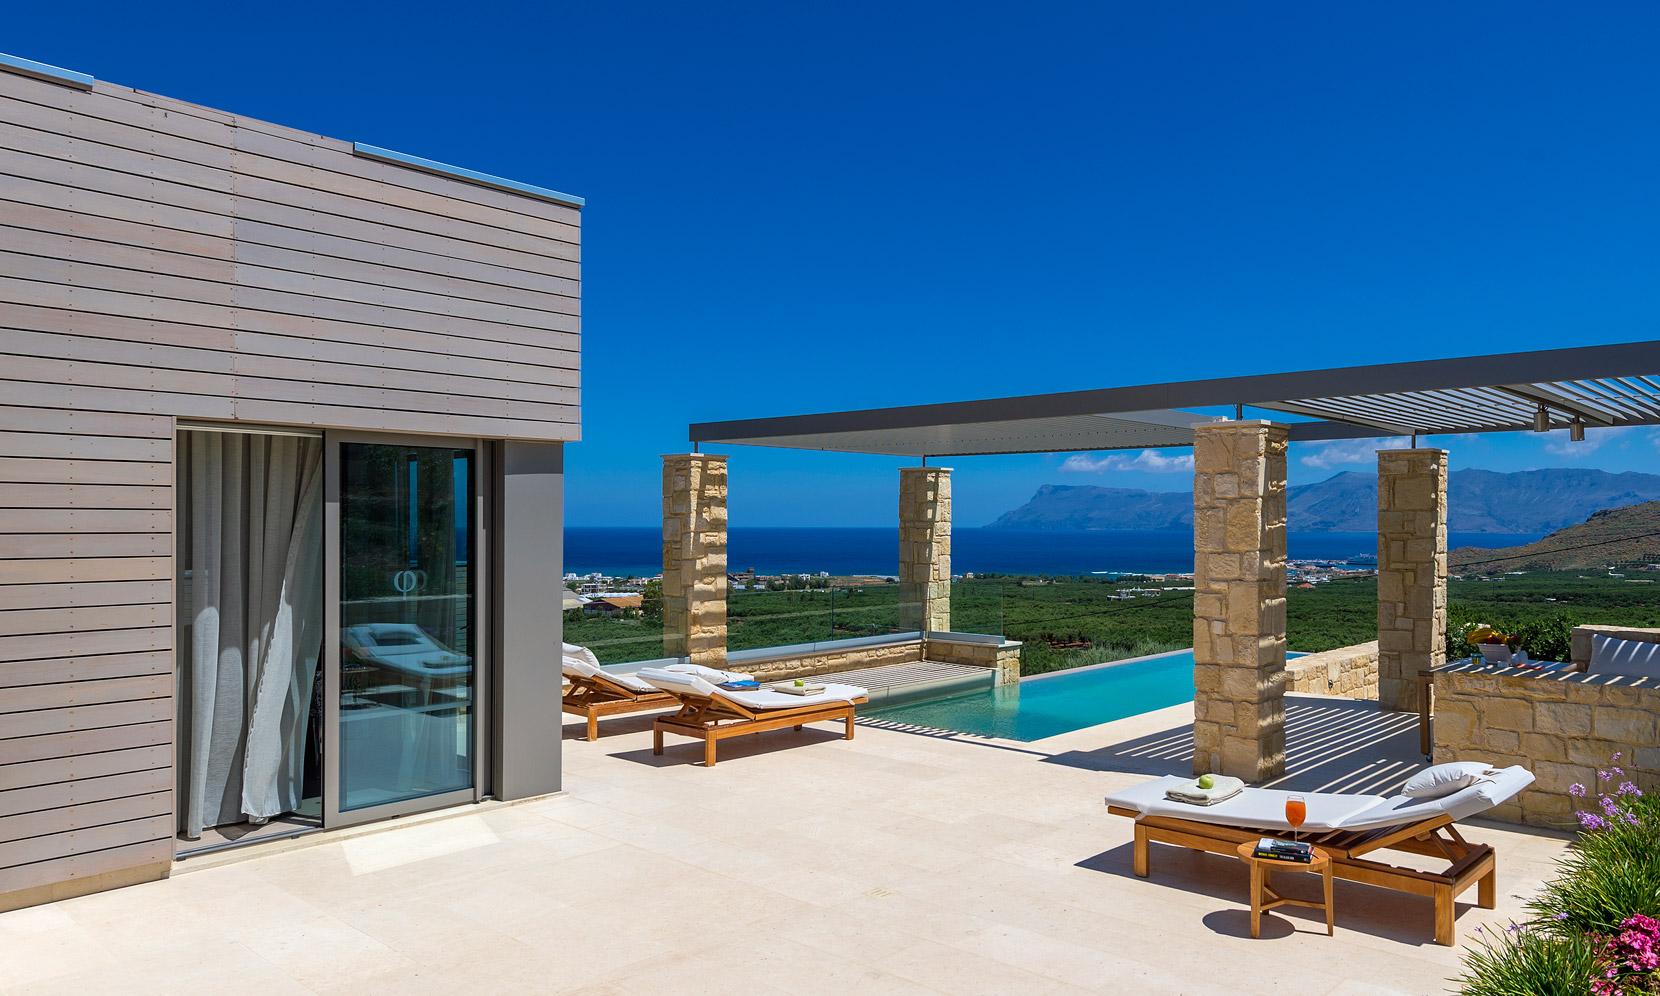 Crete Villa Mango jumbotron image